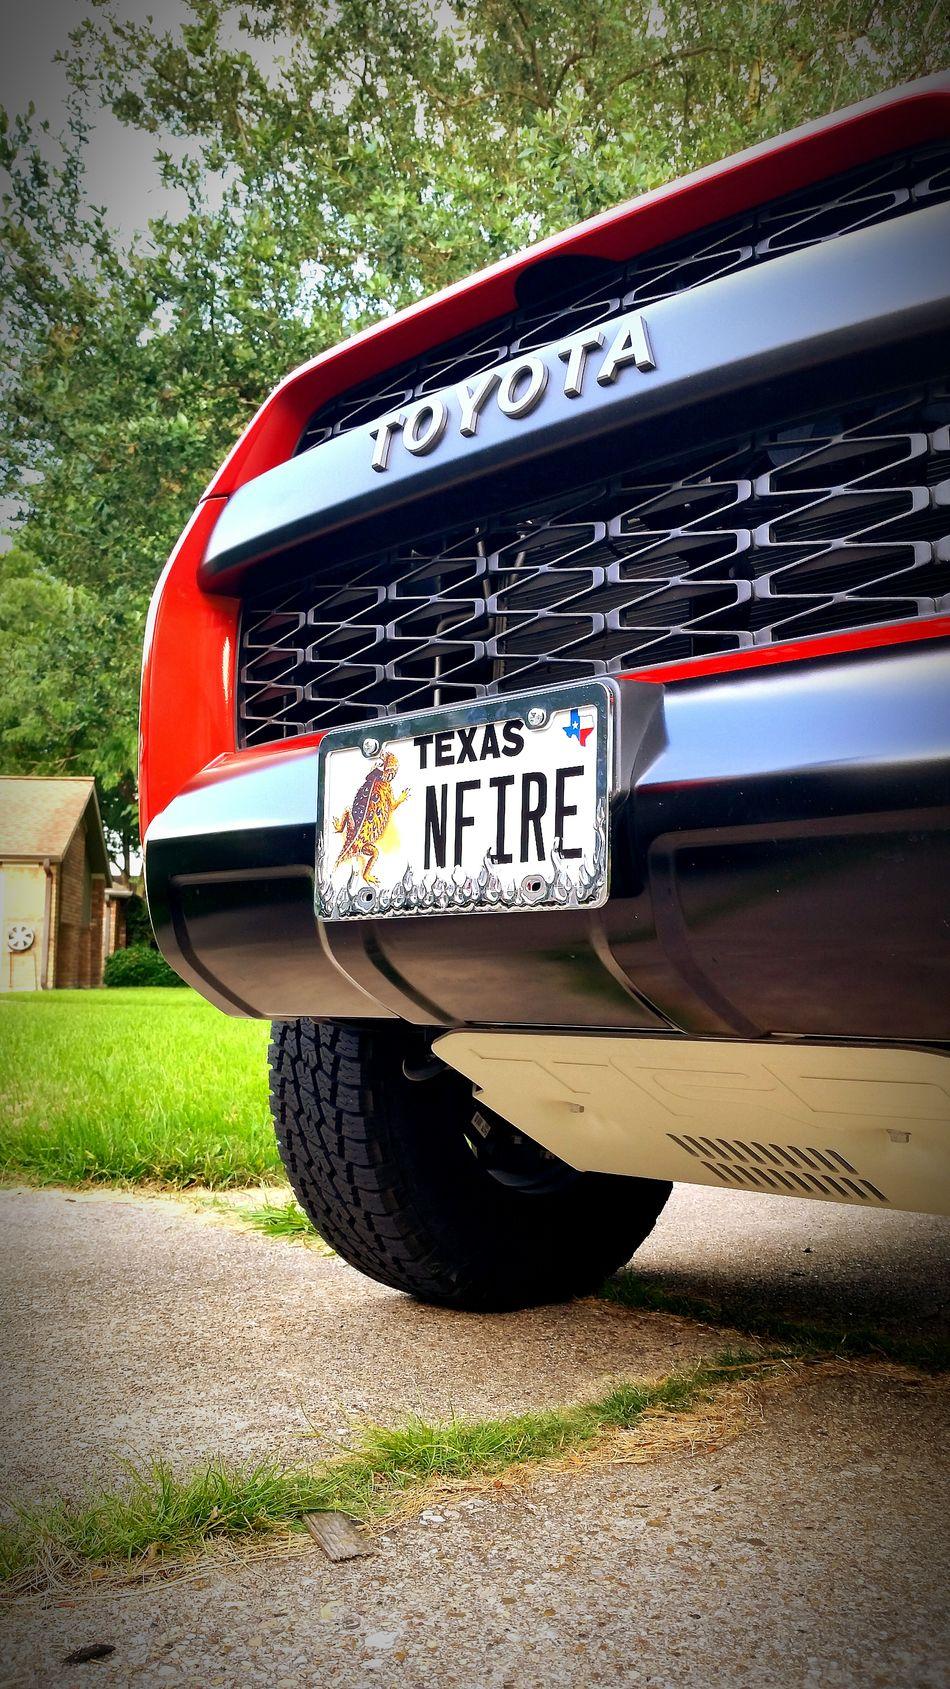 She's on fire! 🔥 4runner Toyota 4runner Trdpro Inferno🔥 Limitededition Ilovemytruck Offroader 4runnernation 4runnermafia